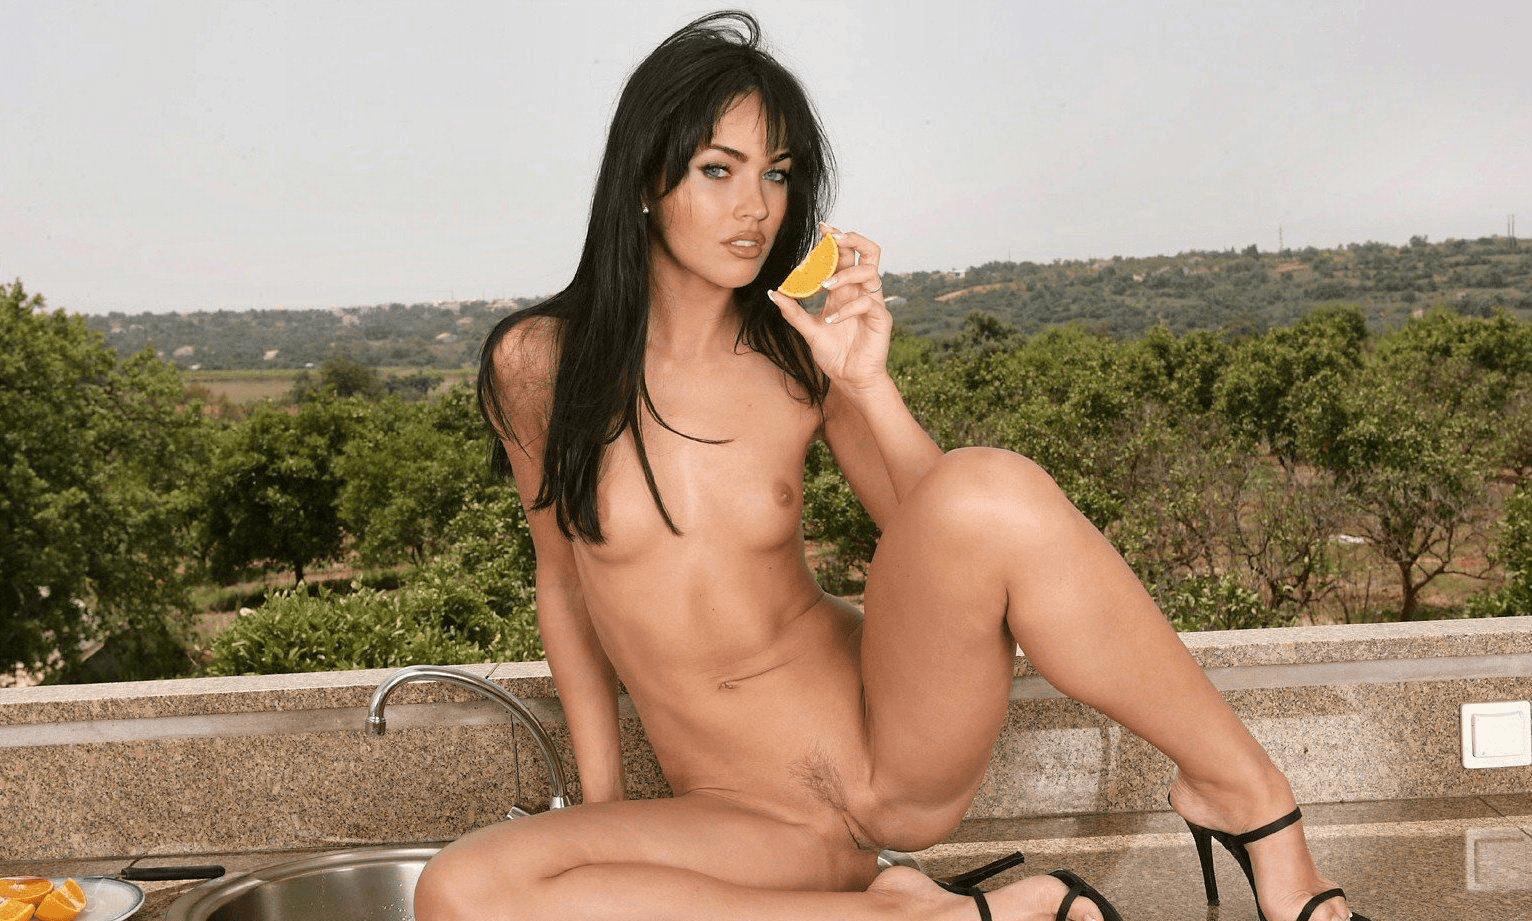 nude-photos-of-megan-mccormick-pantsing-porn-videos